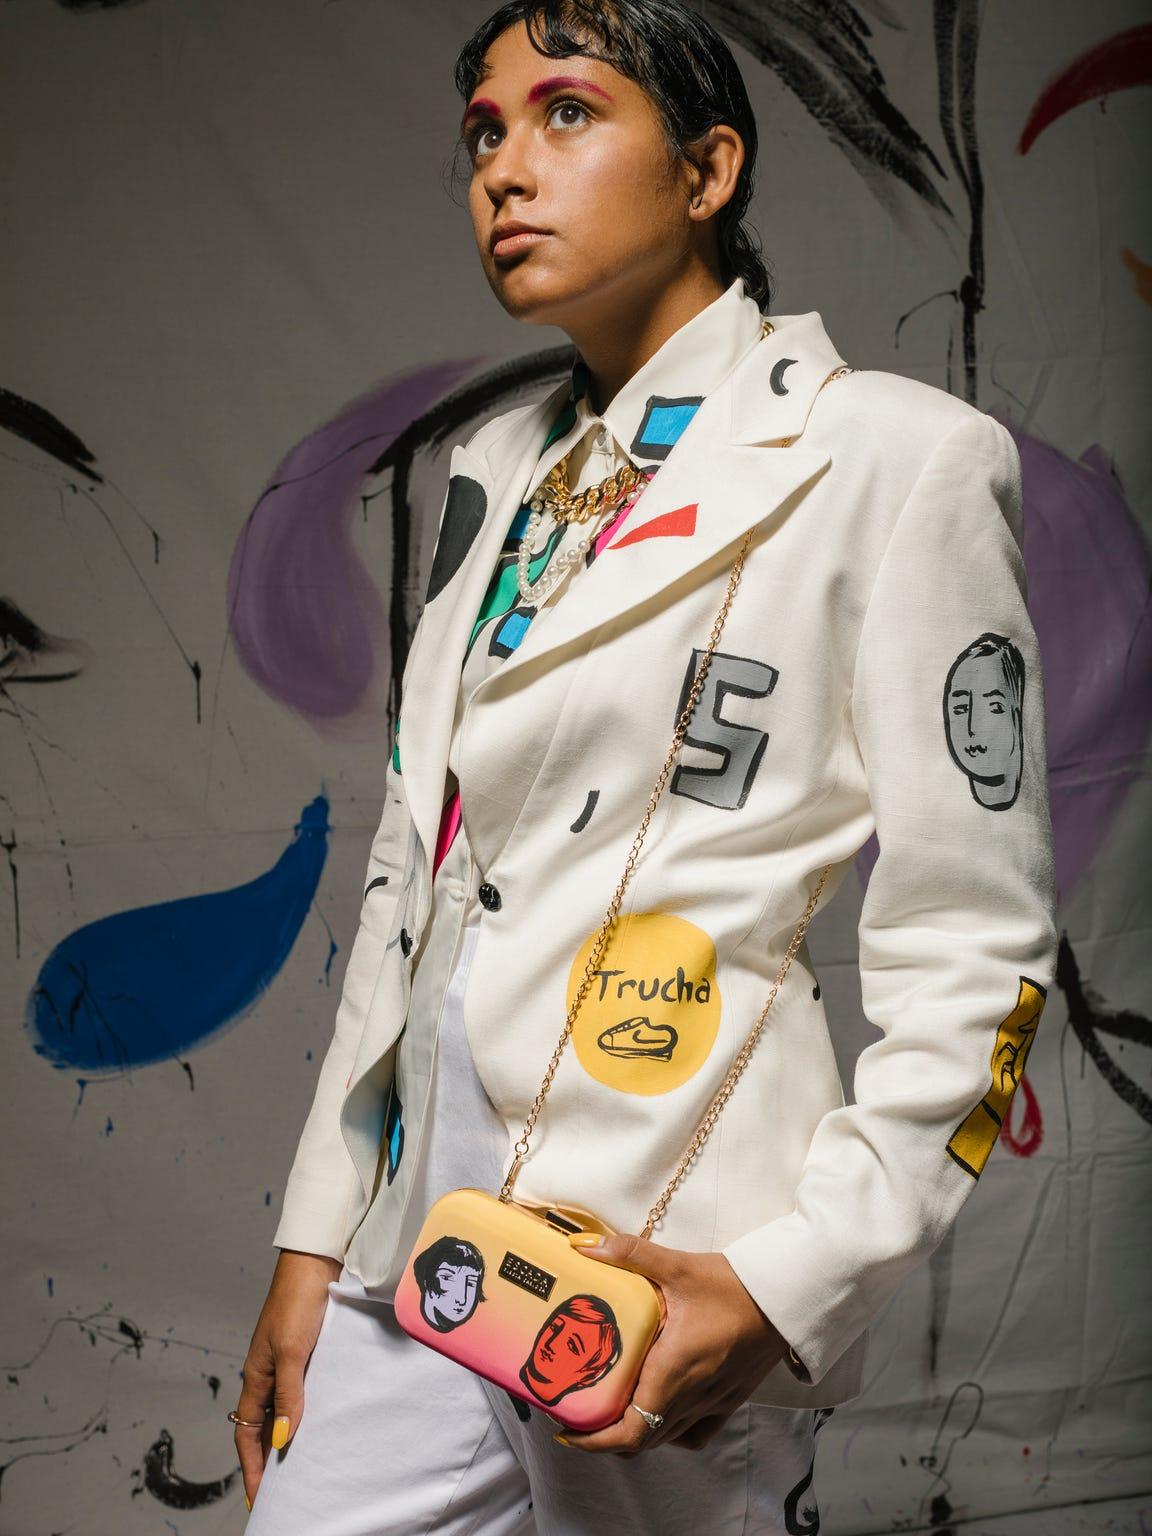 Giselle Urbina in a custom Sofia Enriquez jacket, shirt,